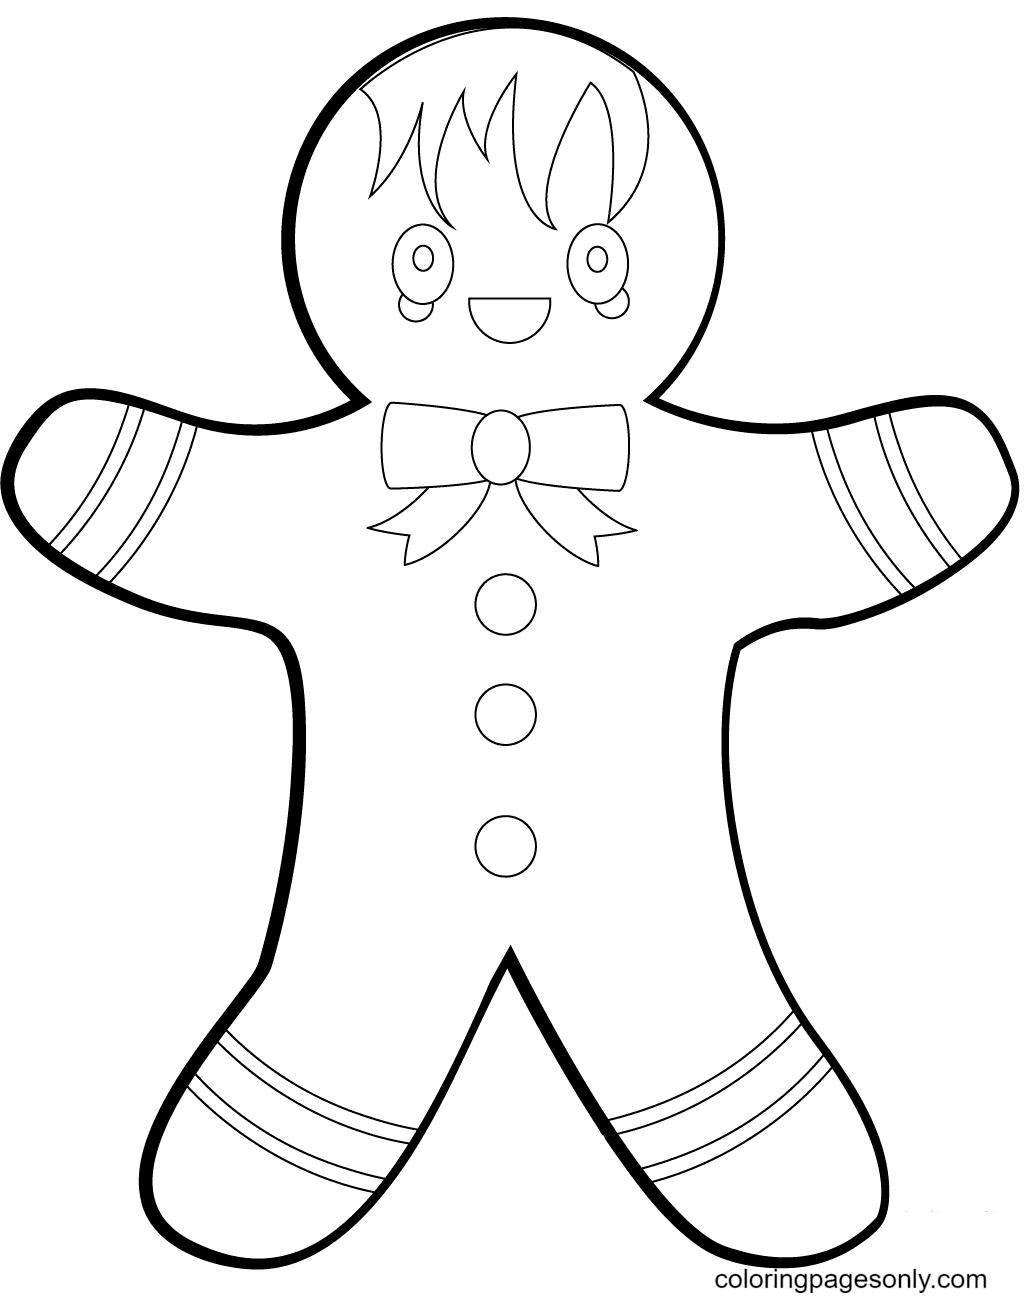 Fun Gingerbread Man Coloring Page